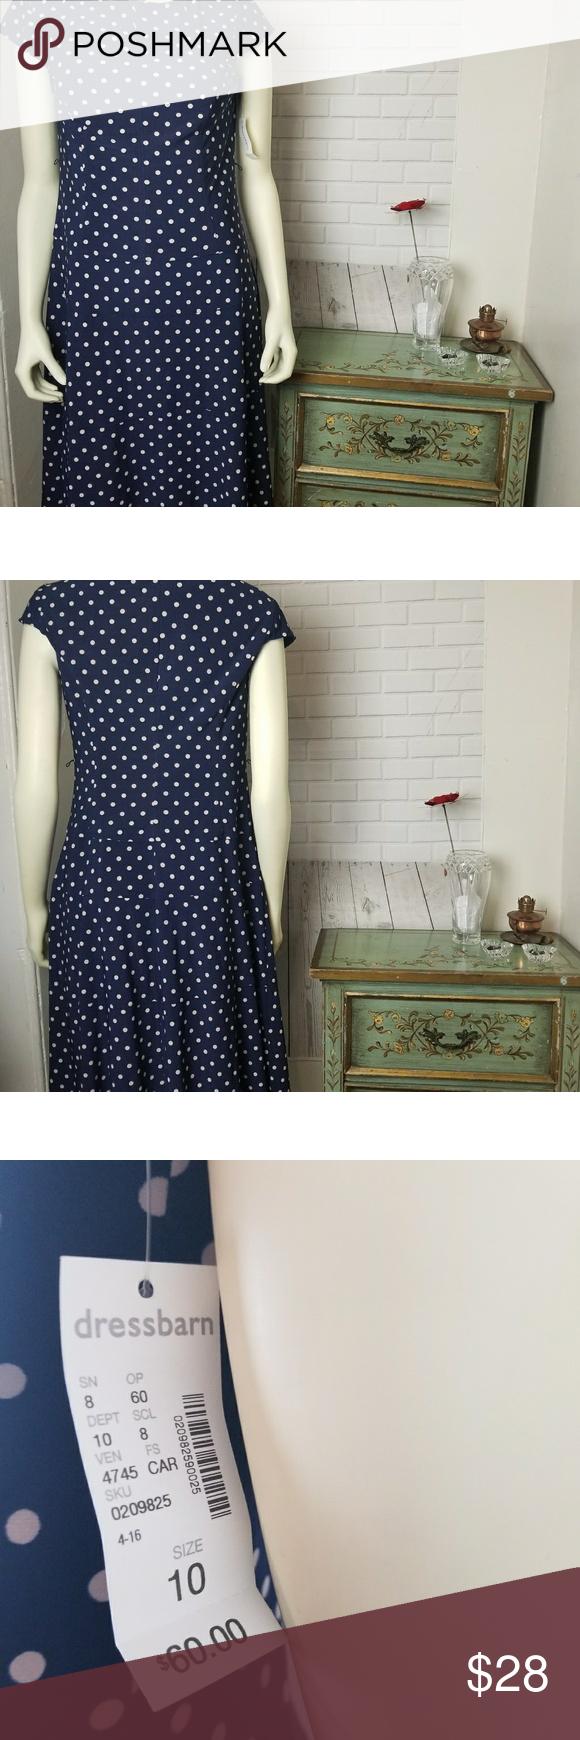 Jones Studio Blue White Polka Dot Dress 10 I love polka dots!! Very Nice Dress. …